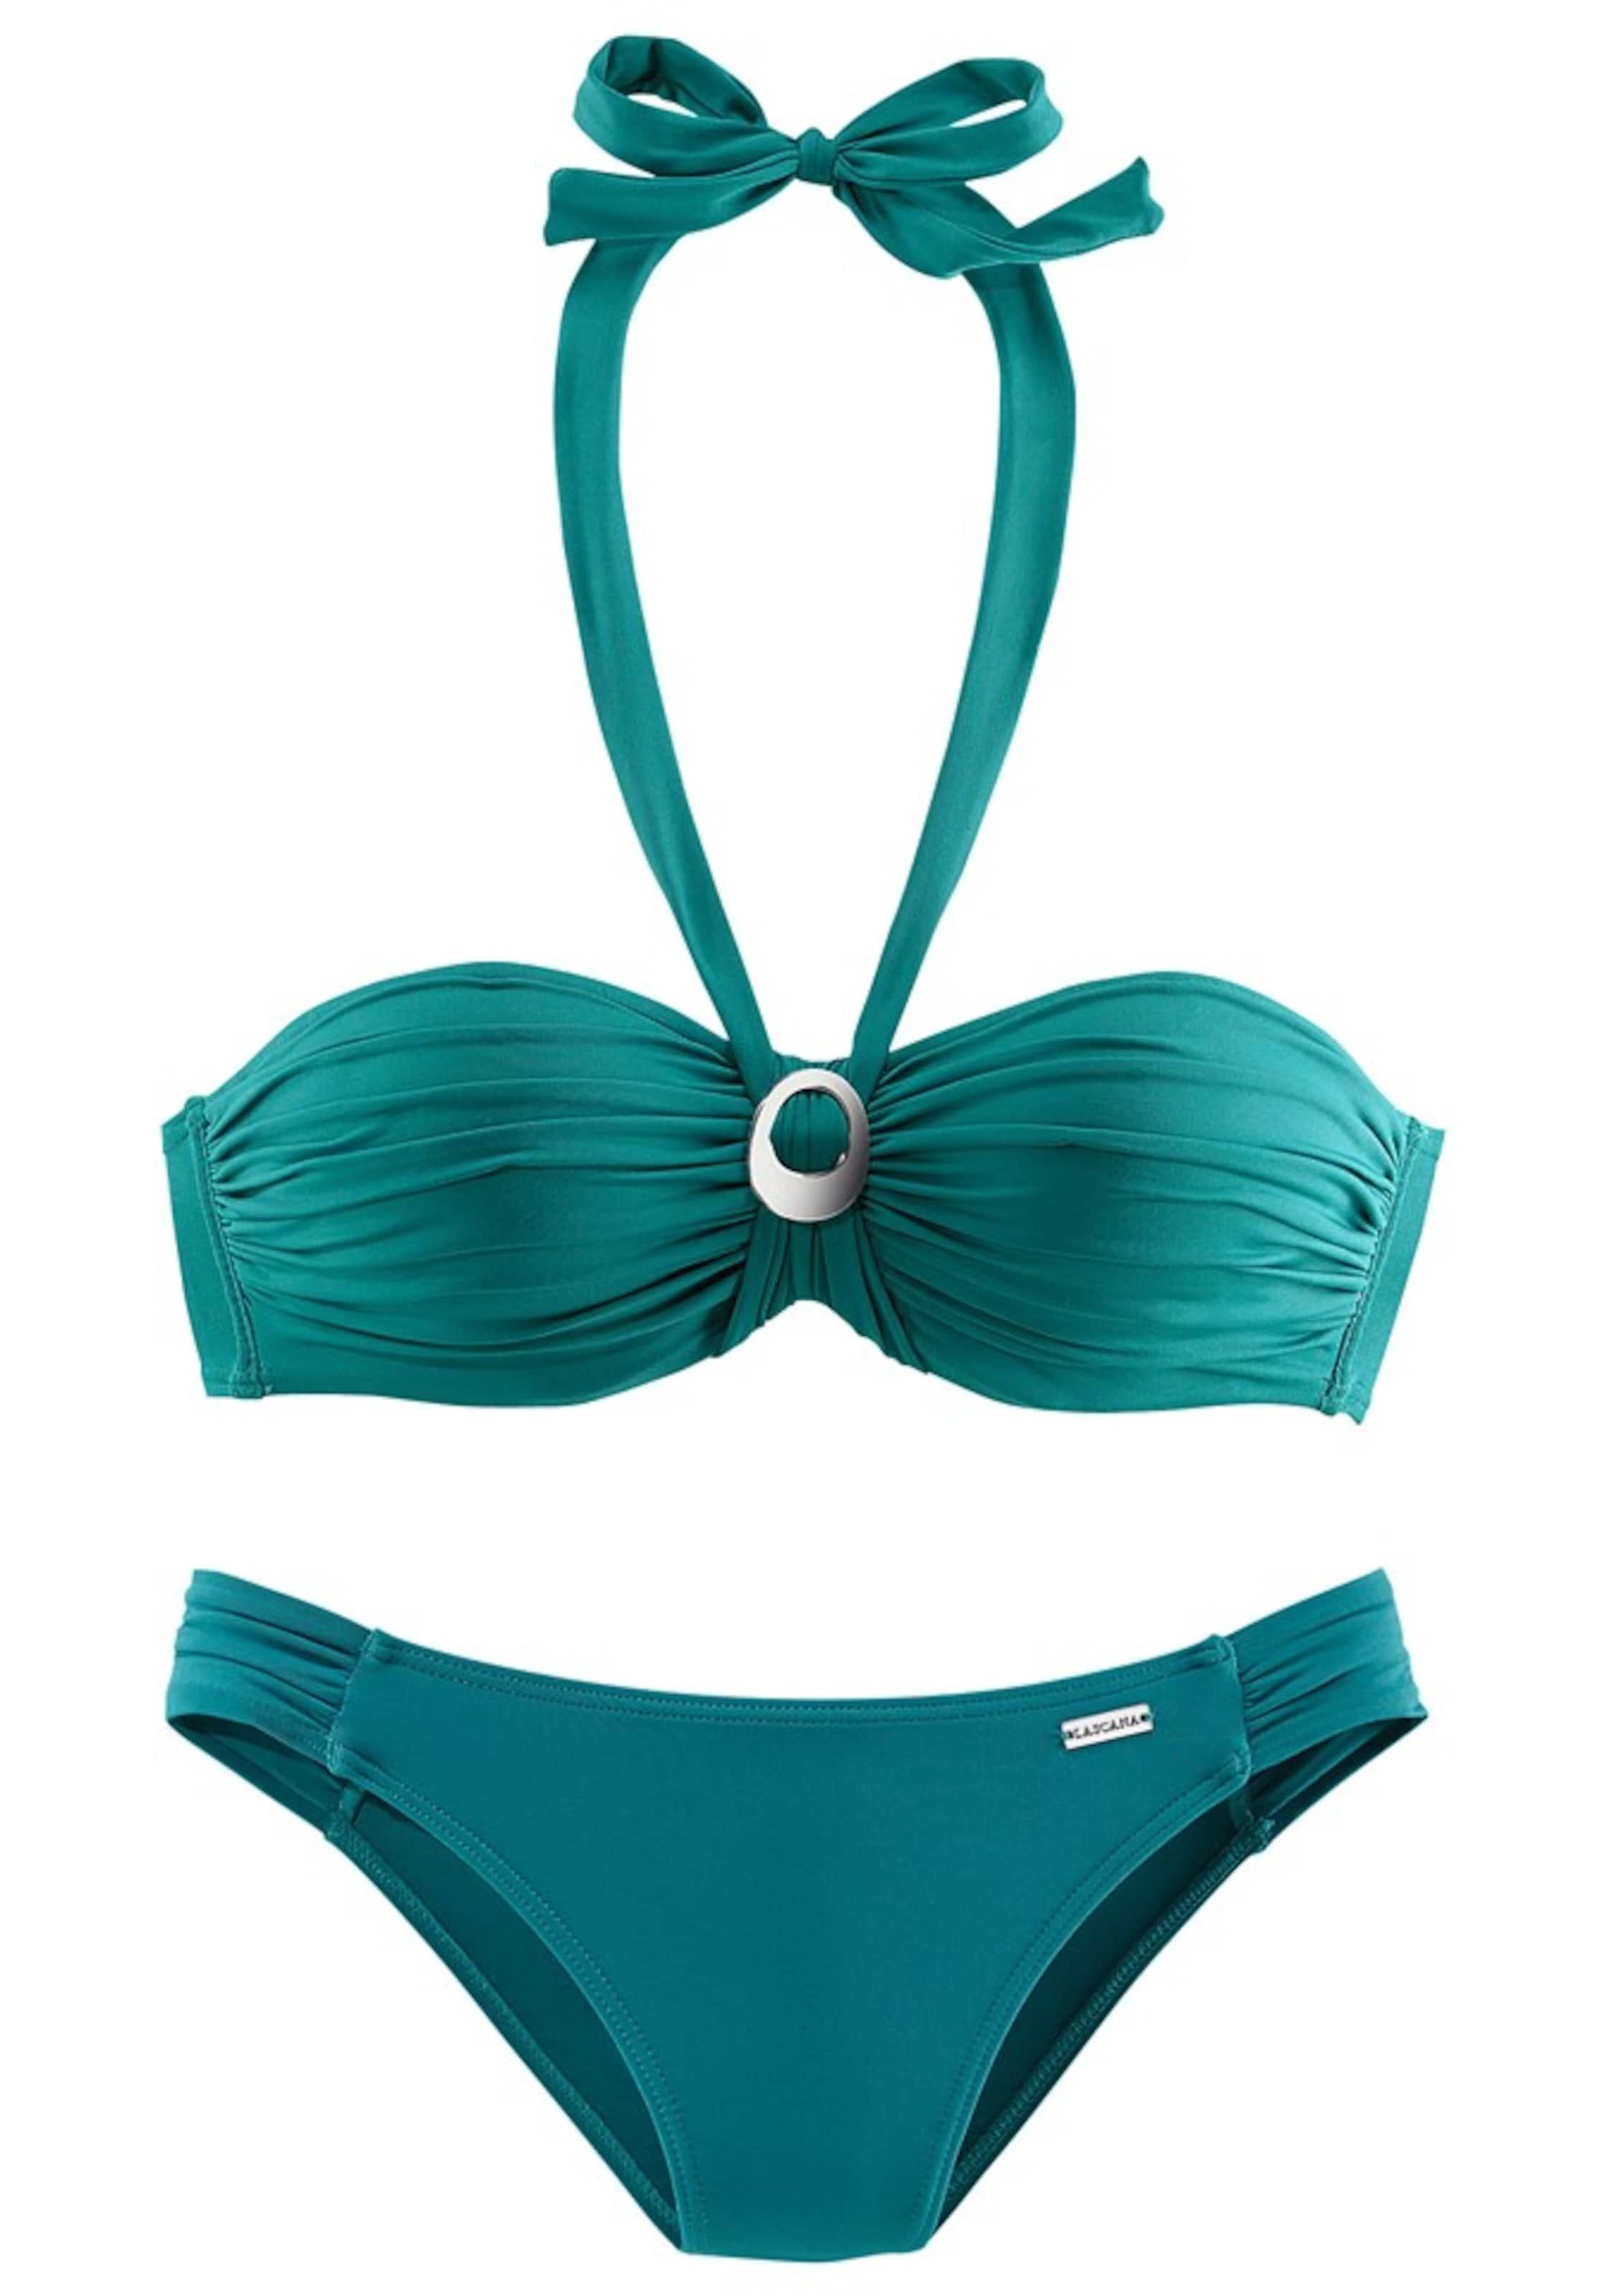 LASCANA Bügel-Bandeau-Bikini Billige Eastbay IqdeE8izz